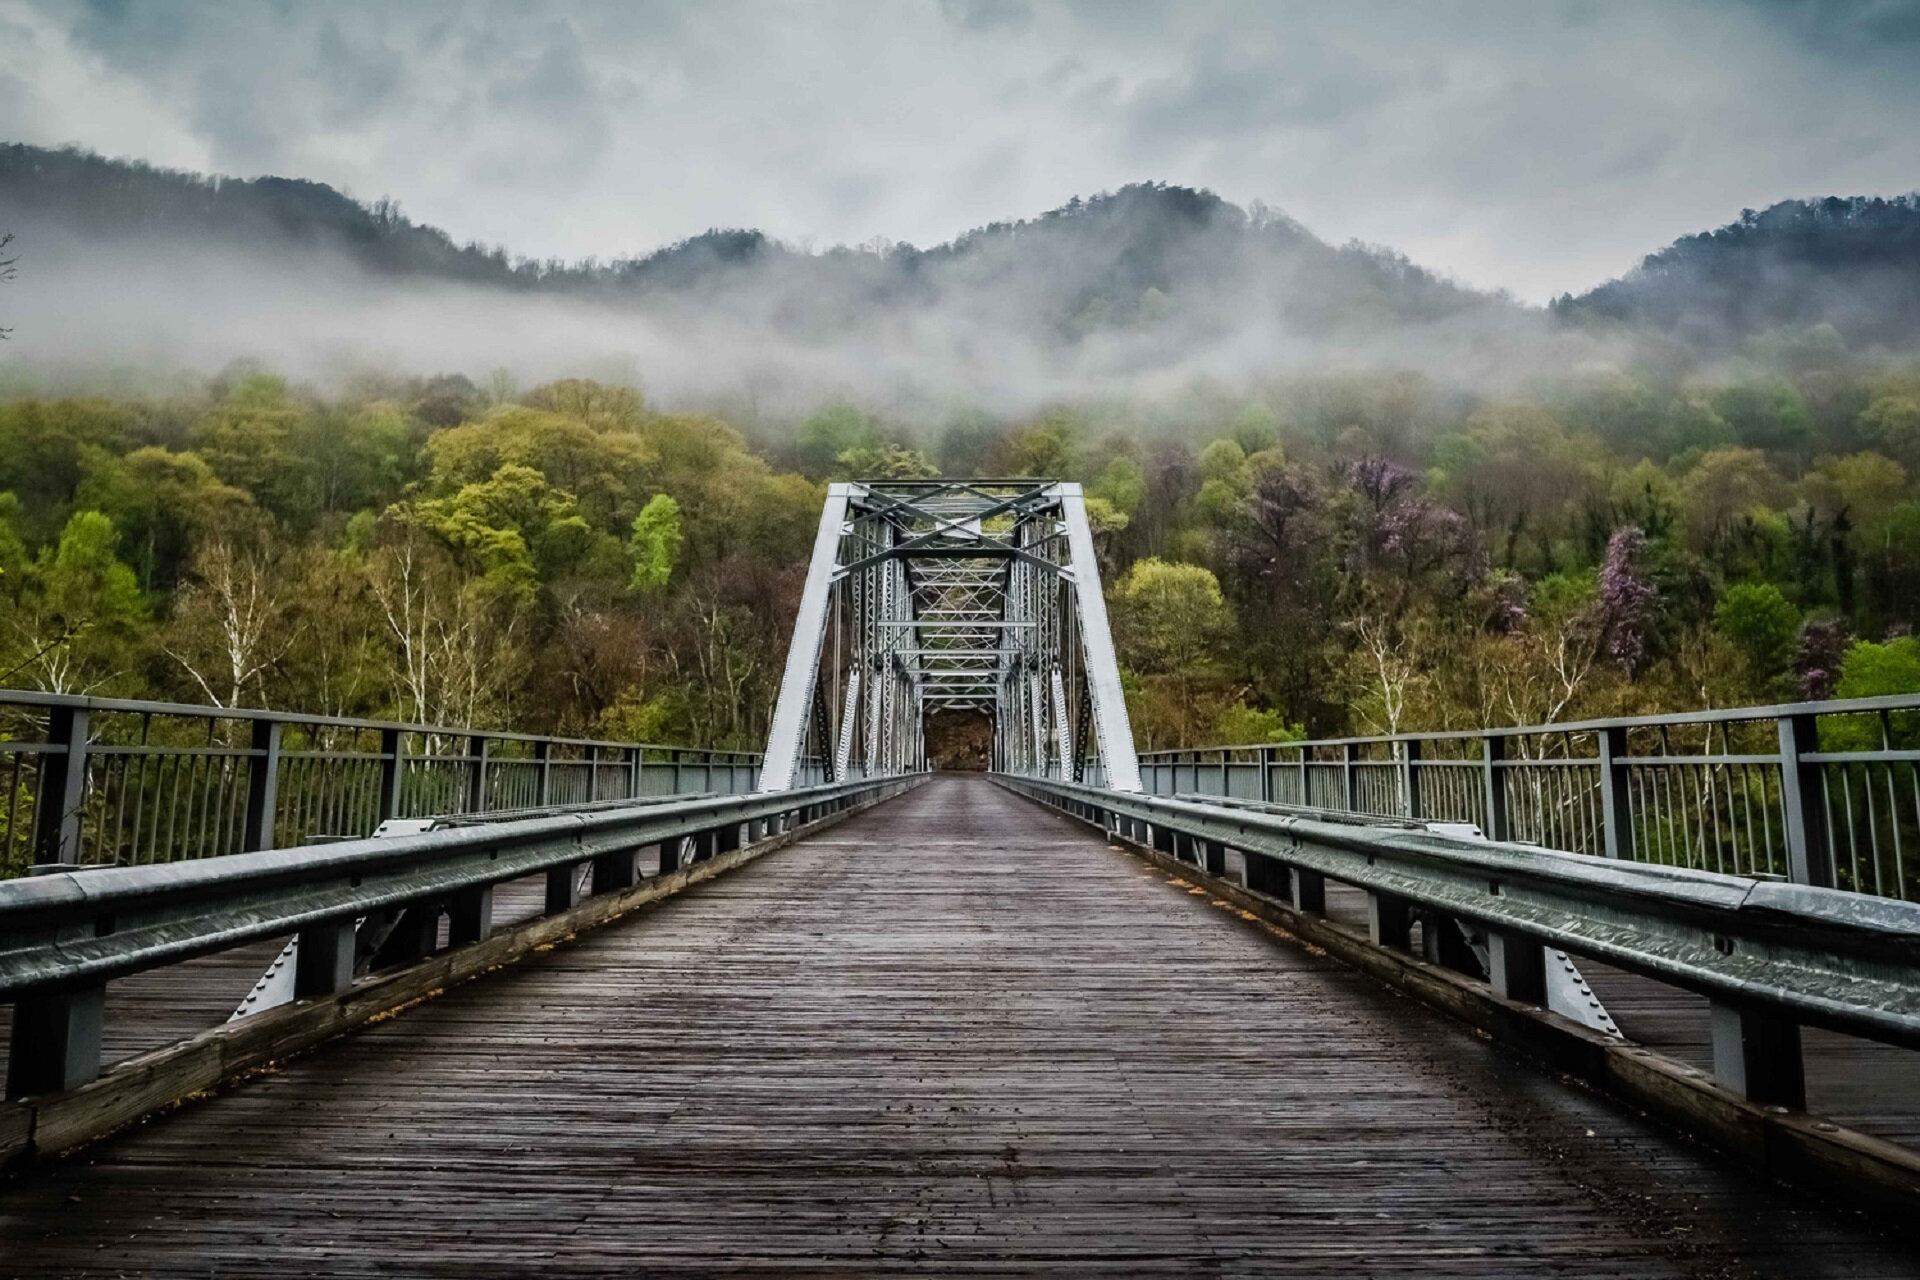 Canva - Foggy Wooden Bridge.jpg